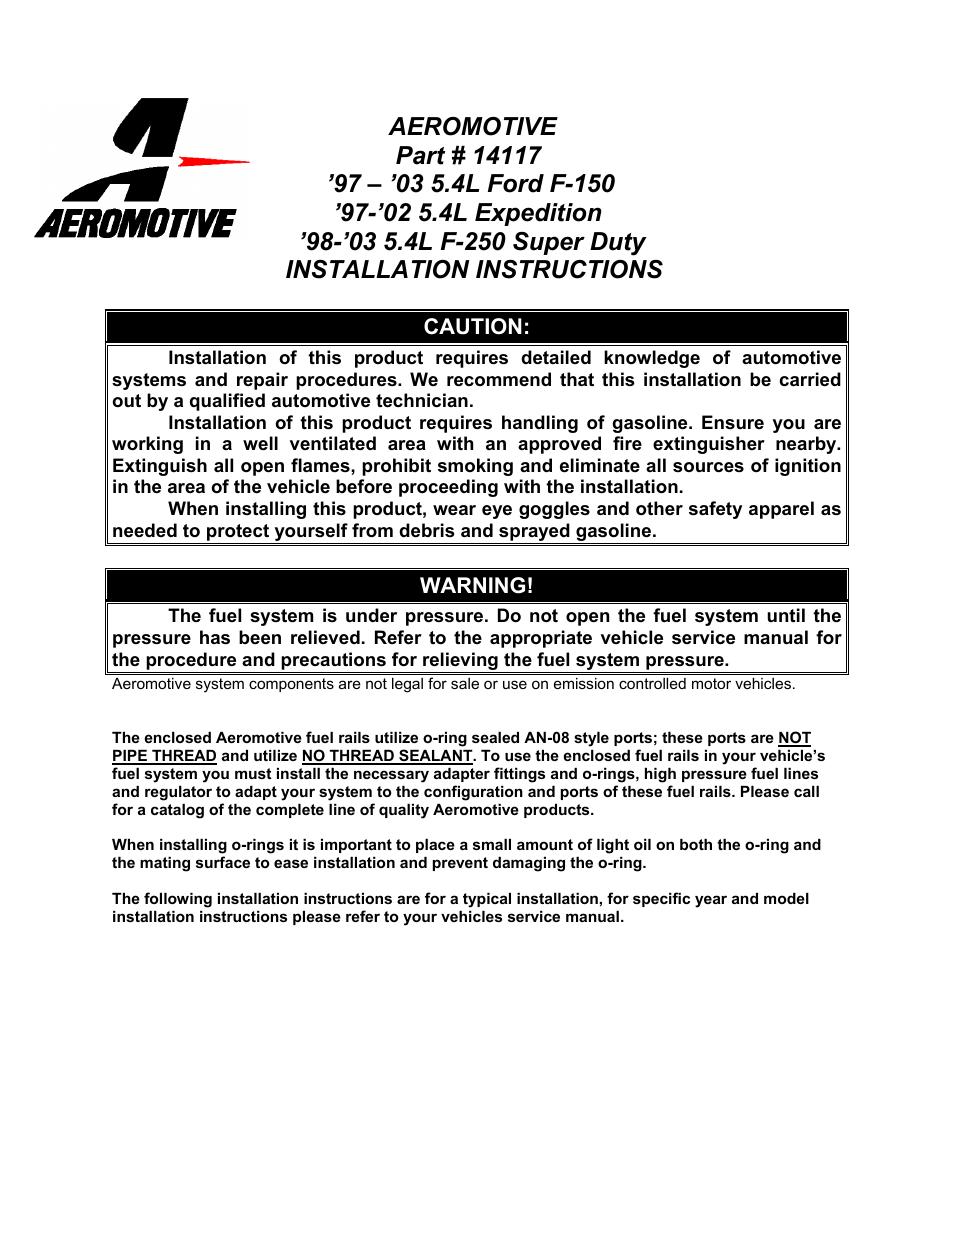 Aeromotive 14117 - 97-05 5.4L 2-VALVE TRUCK & SUV FUEL RAIL KIT User Manual  | 4 pages